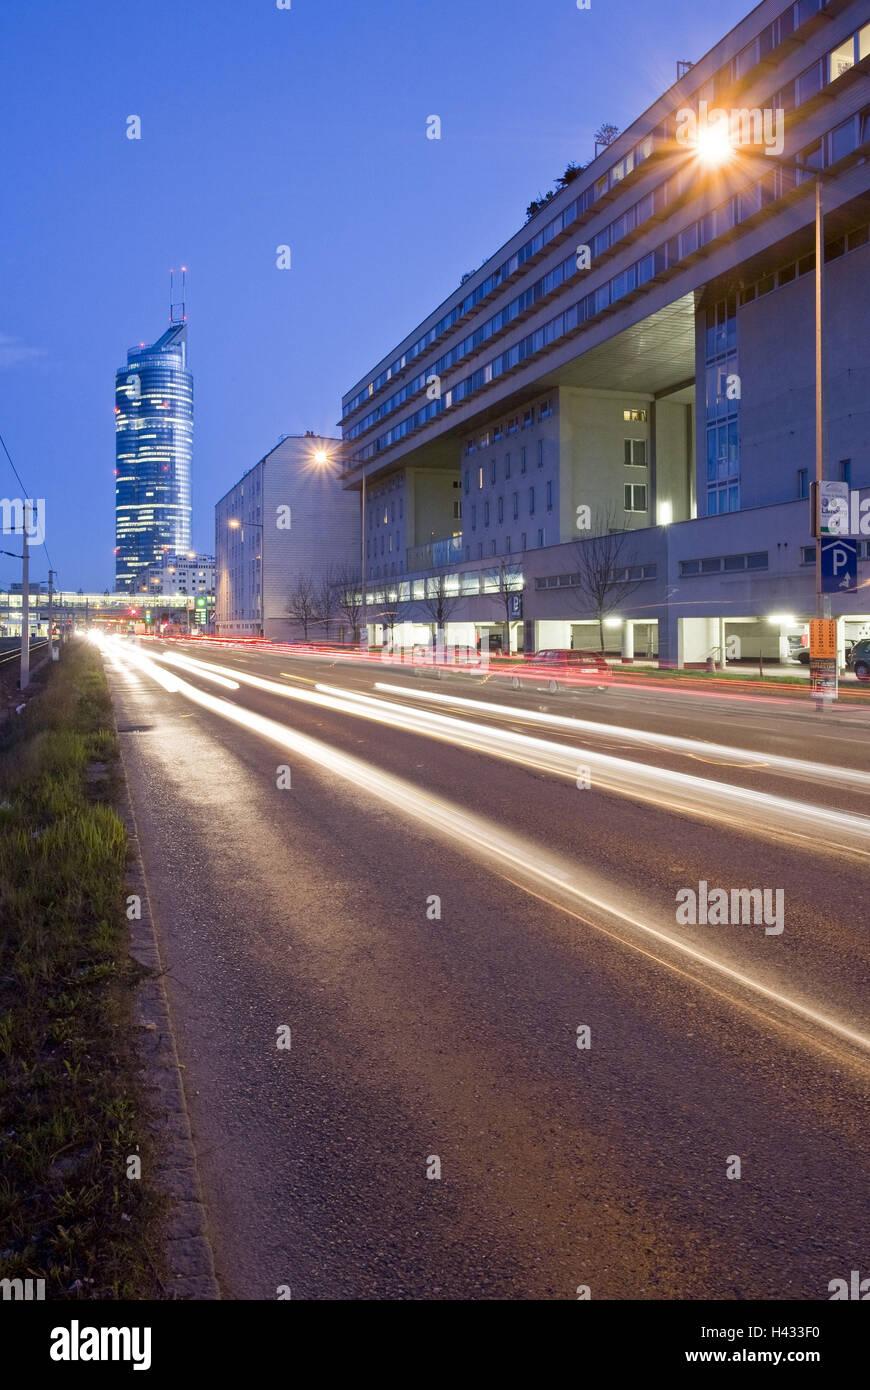 Austria, Vienna, commercial imitation leather, Milleniumstower, street, light tracks, night, - Stock Image